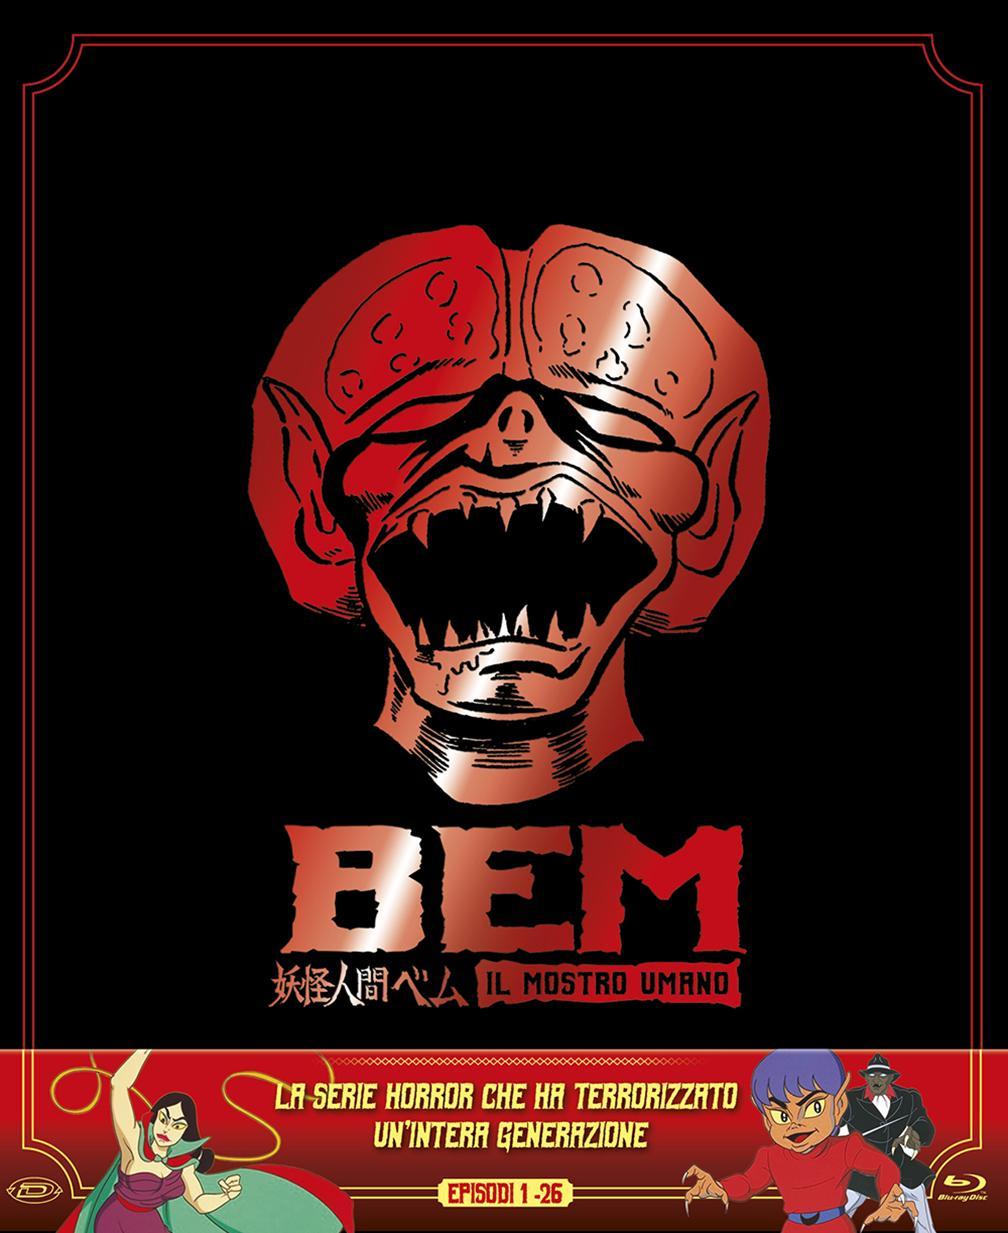 COF.BEM IL MOSTRO UMANO LIMITED EDITION BOX SET (EPS 01-26) (4 B